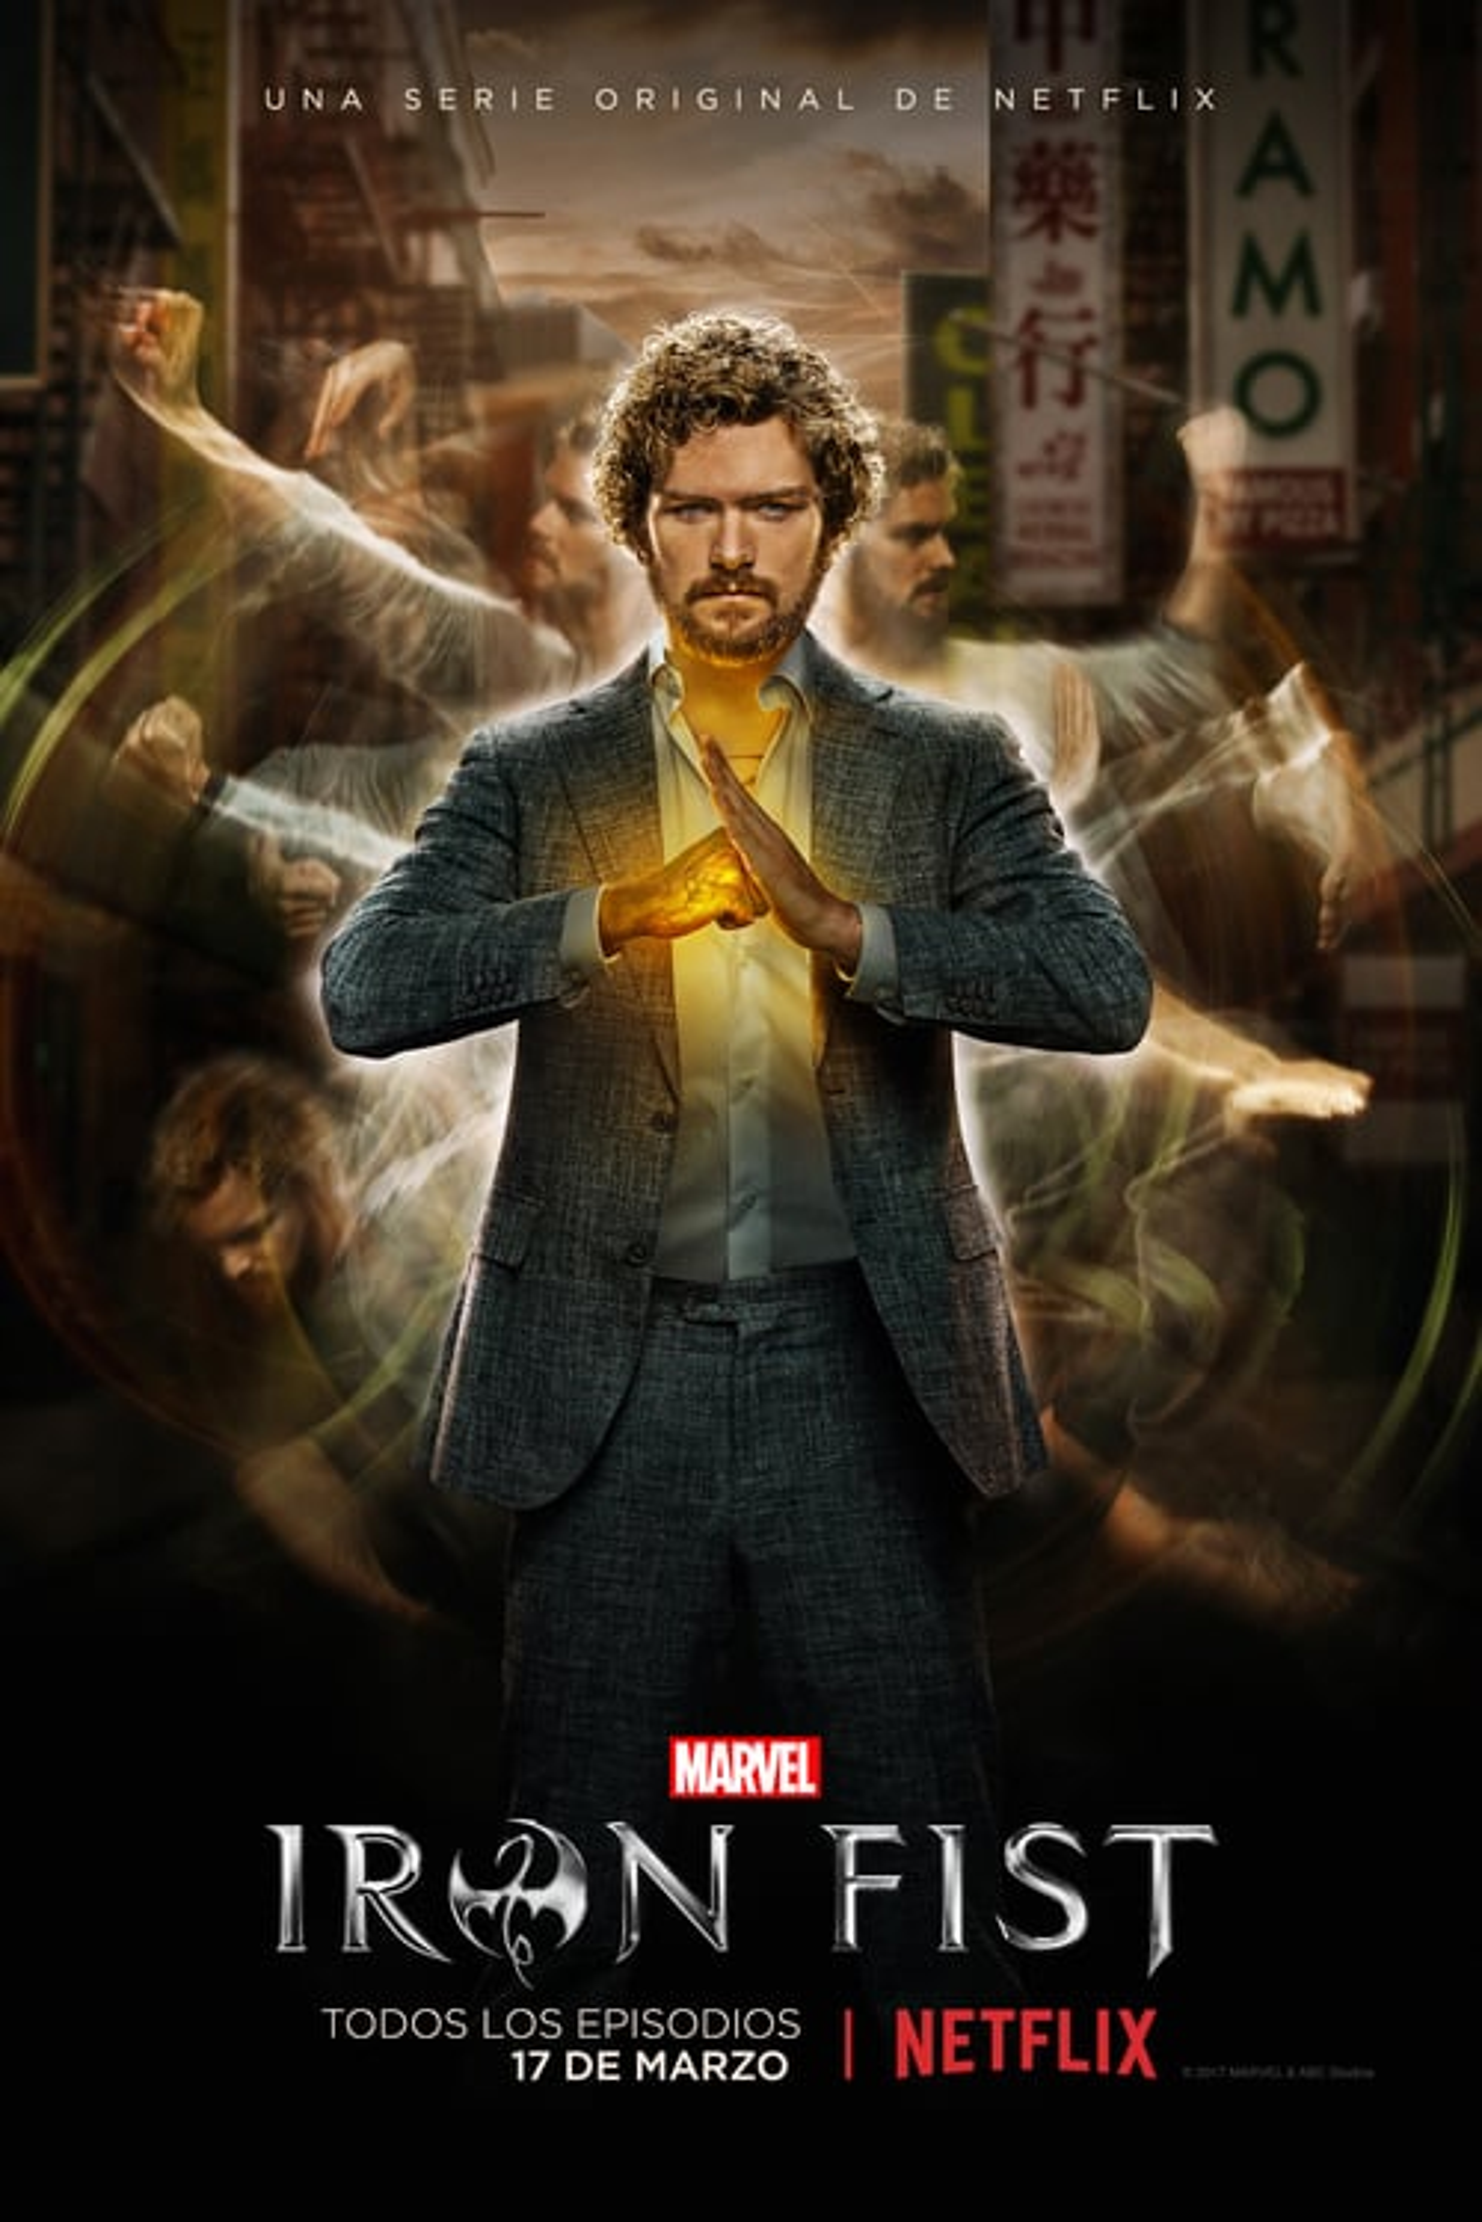 Marvel - Iron Fist poster